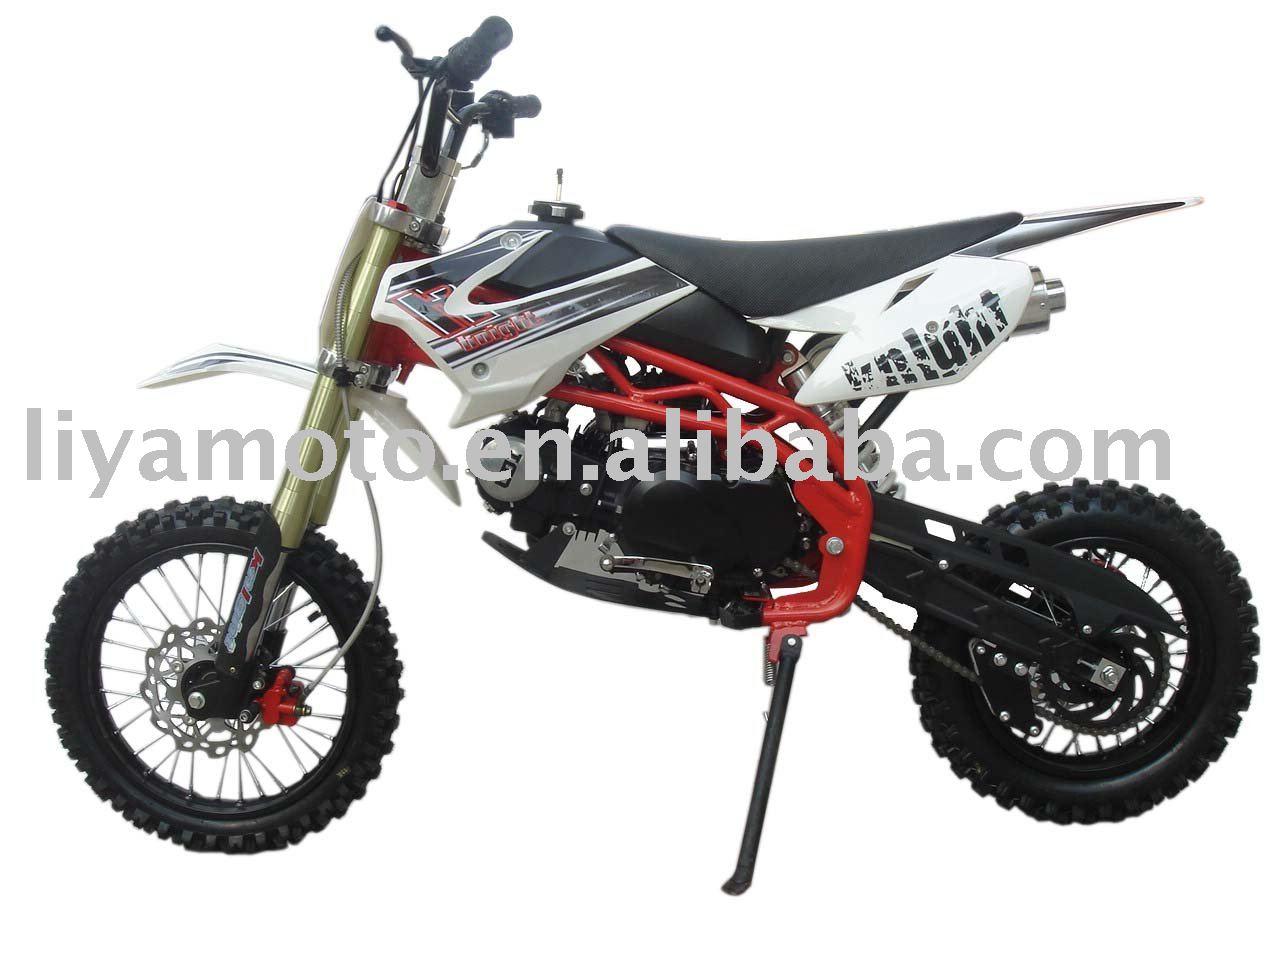 Dirt bike gas 220 125cc new model, dirt bike gas 220 125cc new model